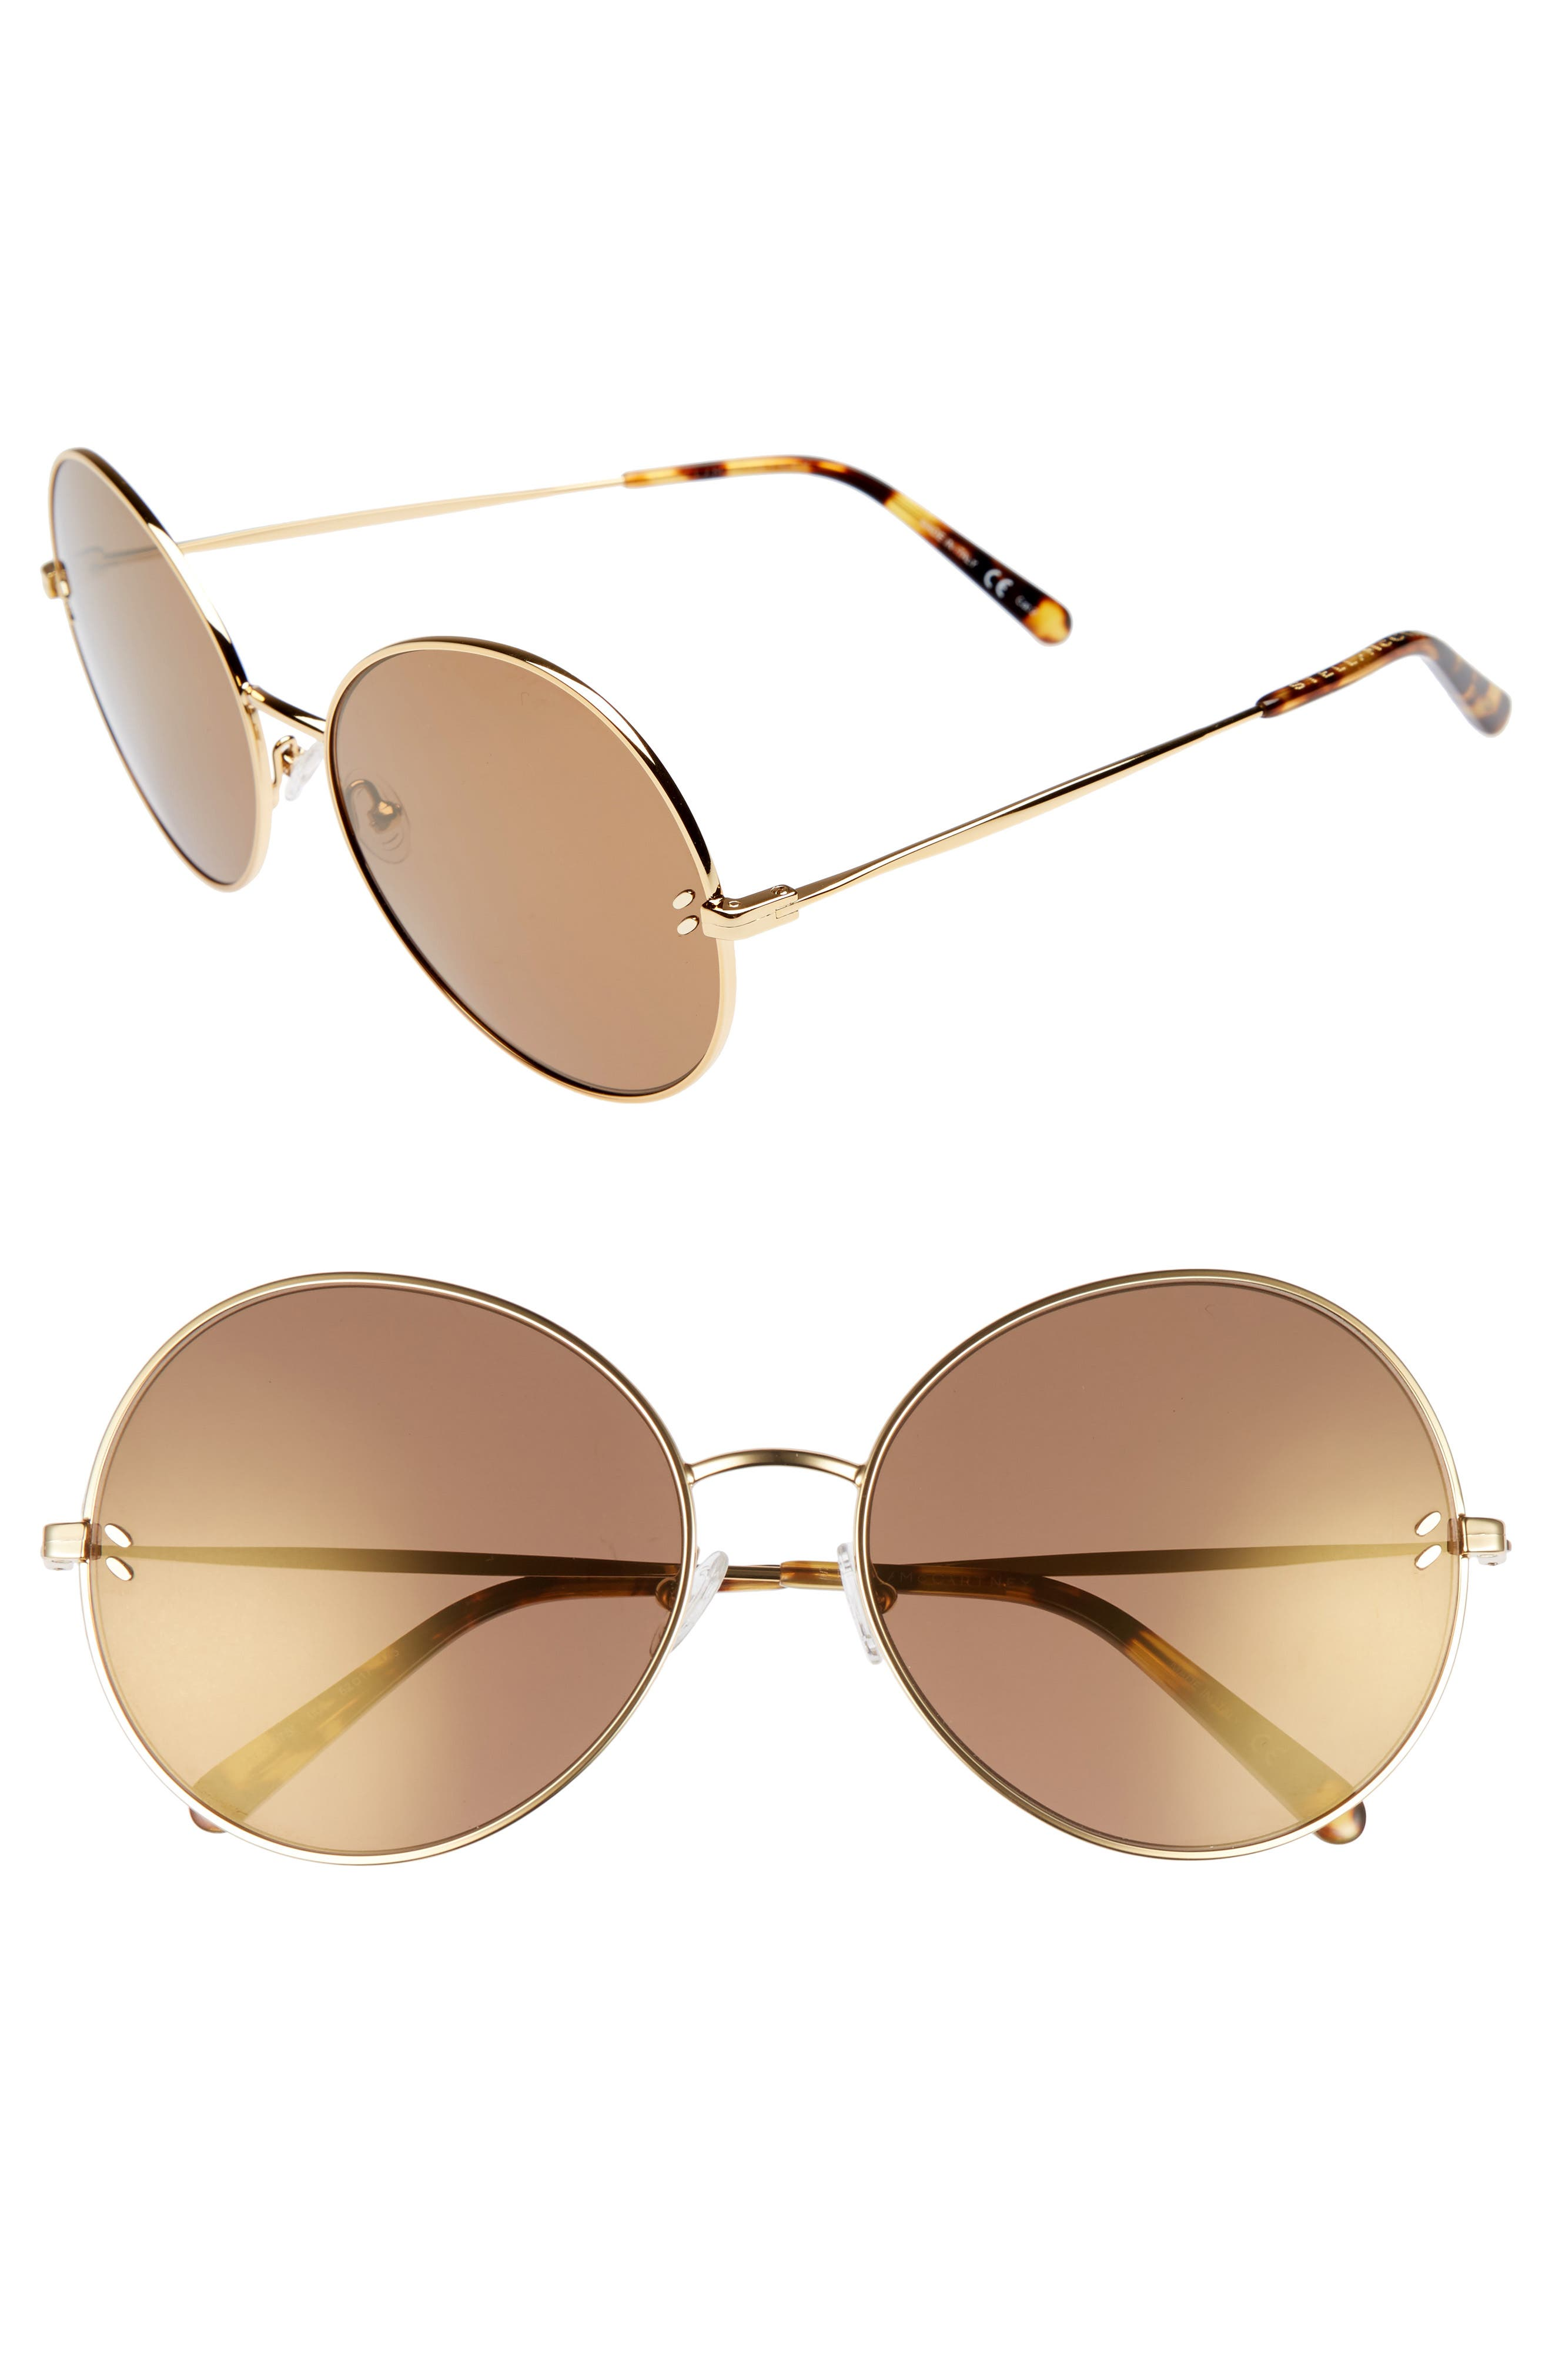 Stella McCartney 62mm Round Sunglasses